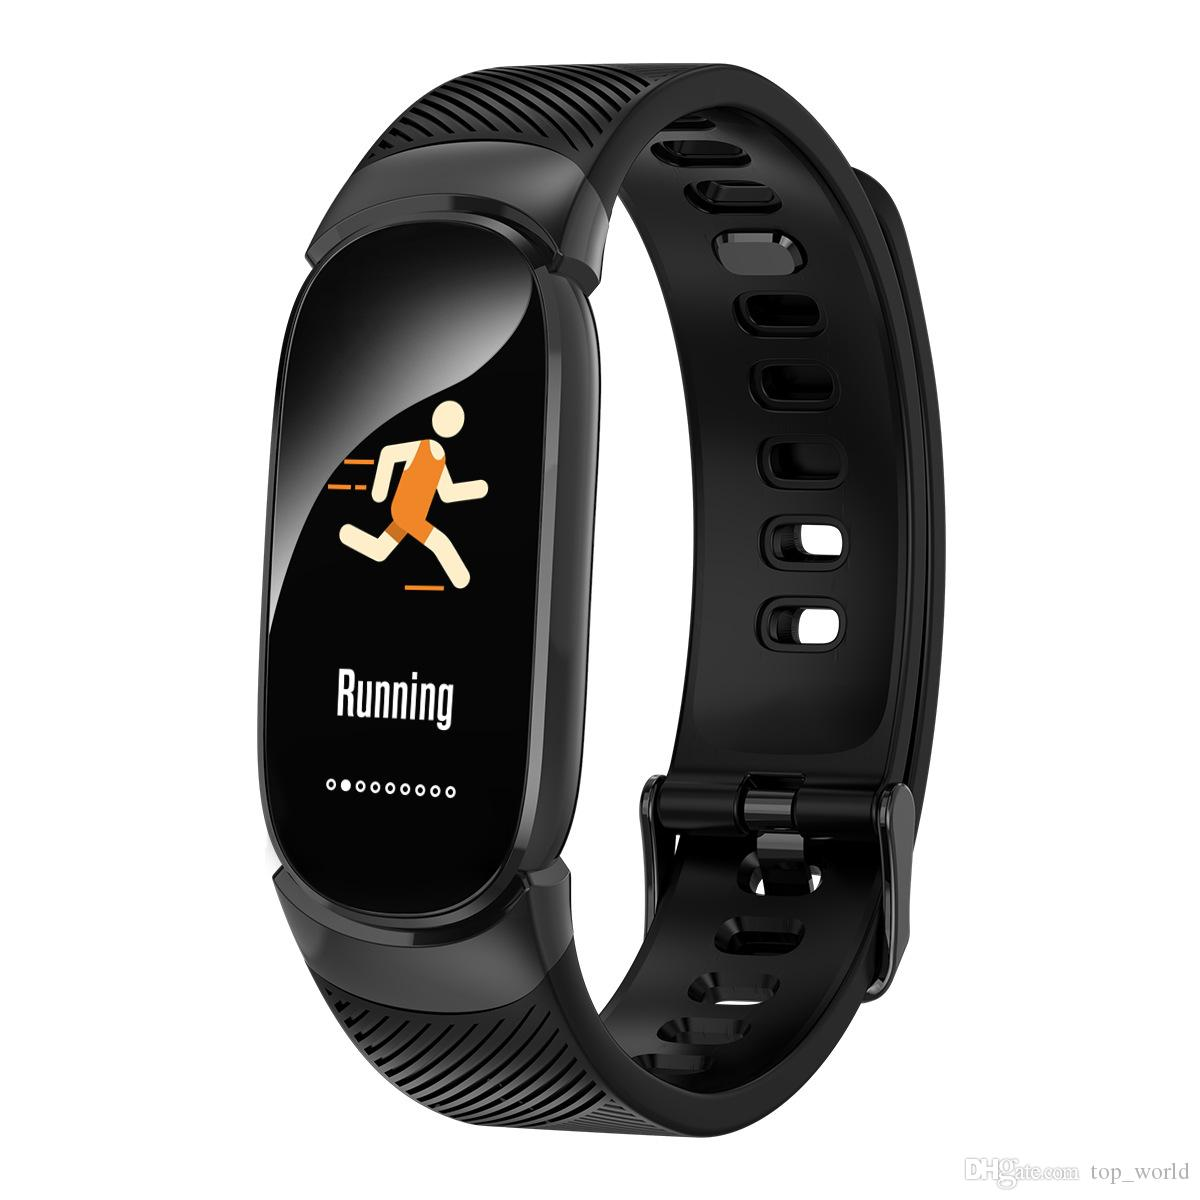 QW16 Smart-Armband Fitness Tracker Band 3 Herzfrequenzmesser Wasserdichte Pedometer Sport Uhr-Mode-Smart-Armband